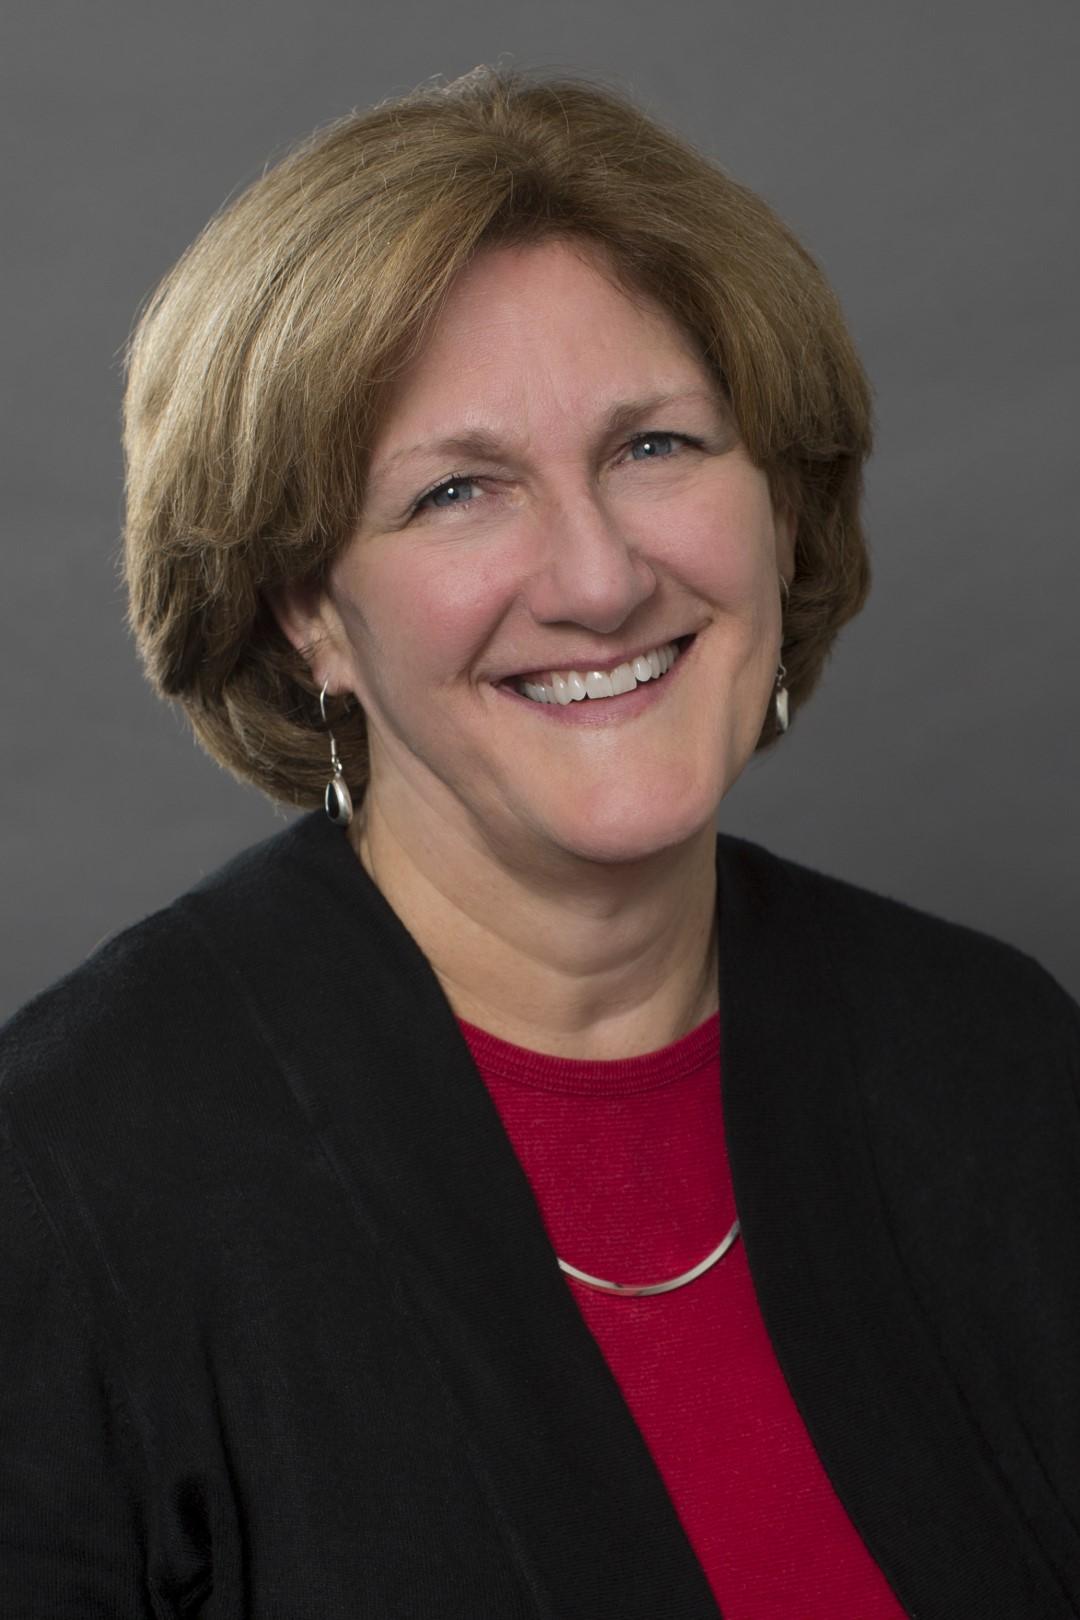 Darlene Wahaus